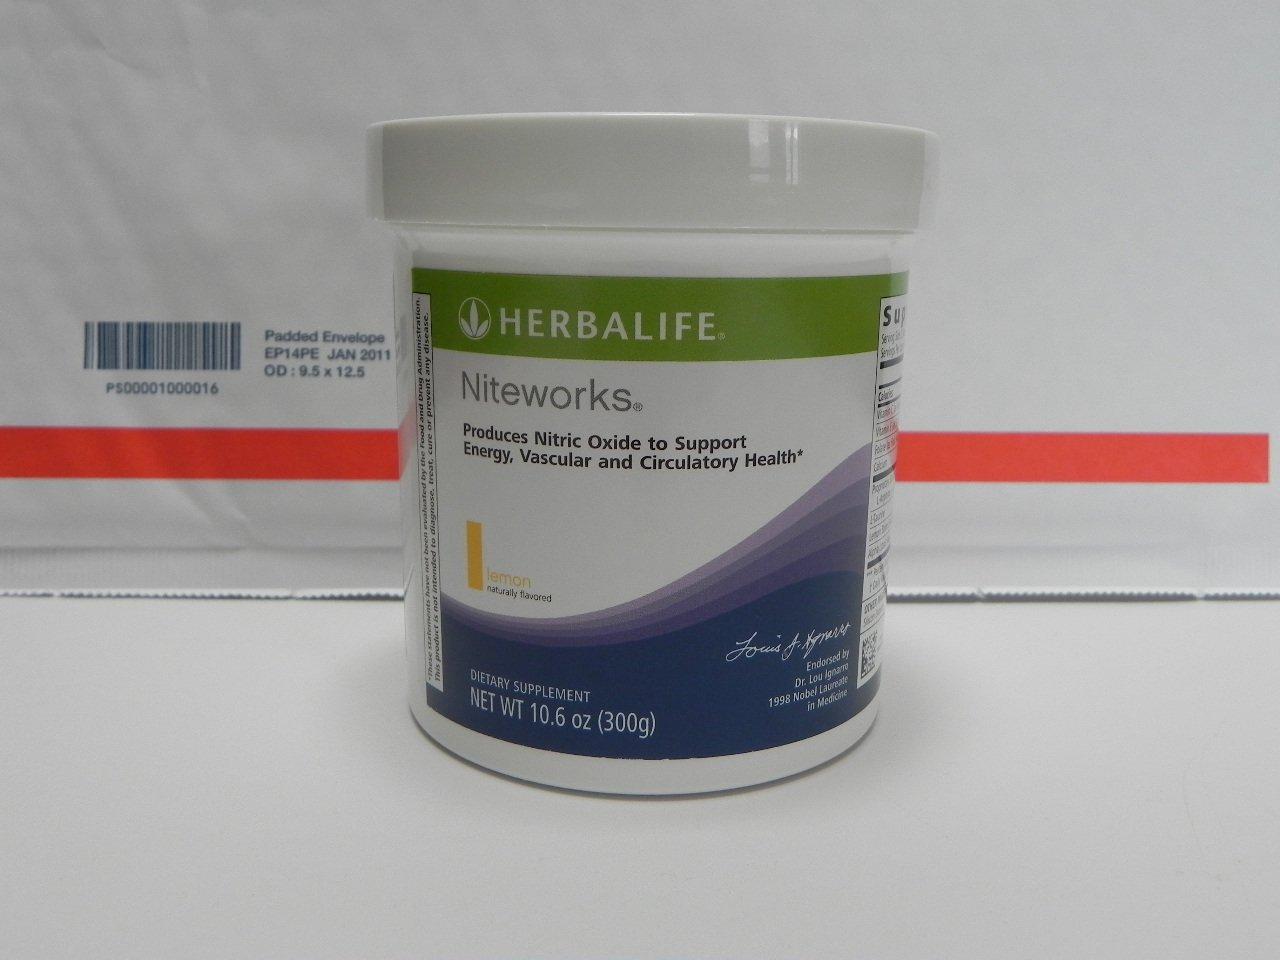 Herbalife Niteworks Cardio Supplement Lemon 300g 10.6oz 2011